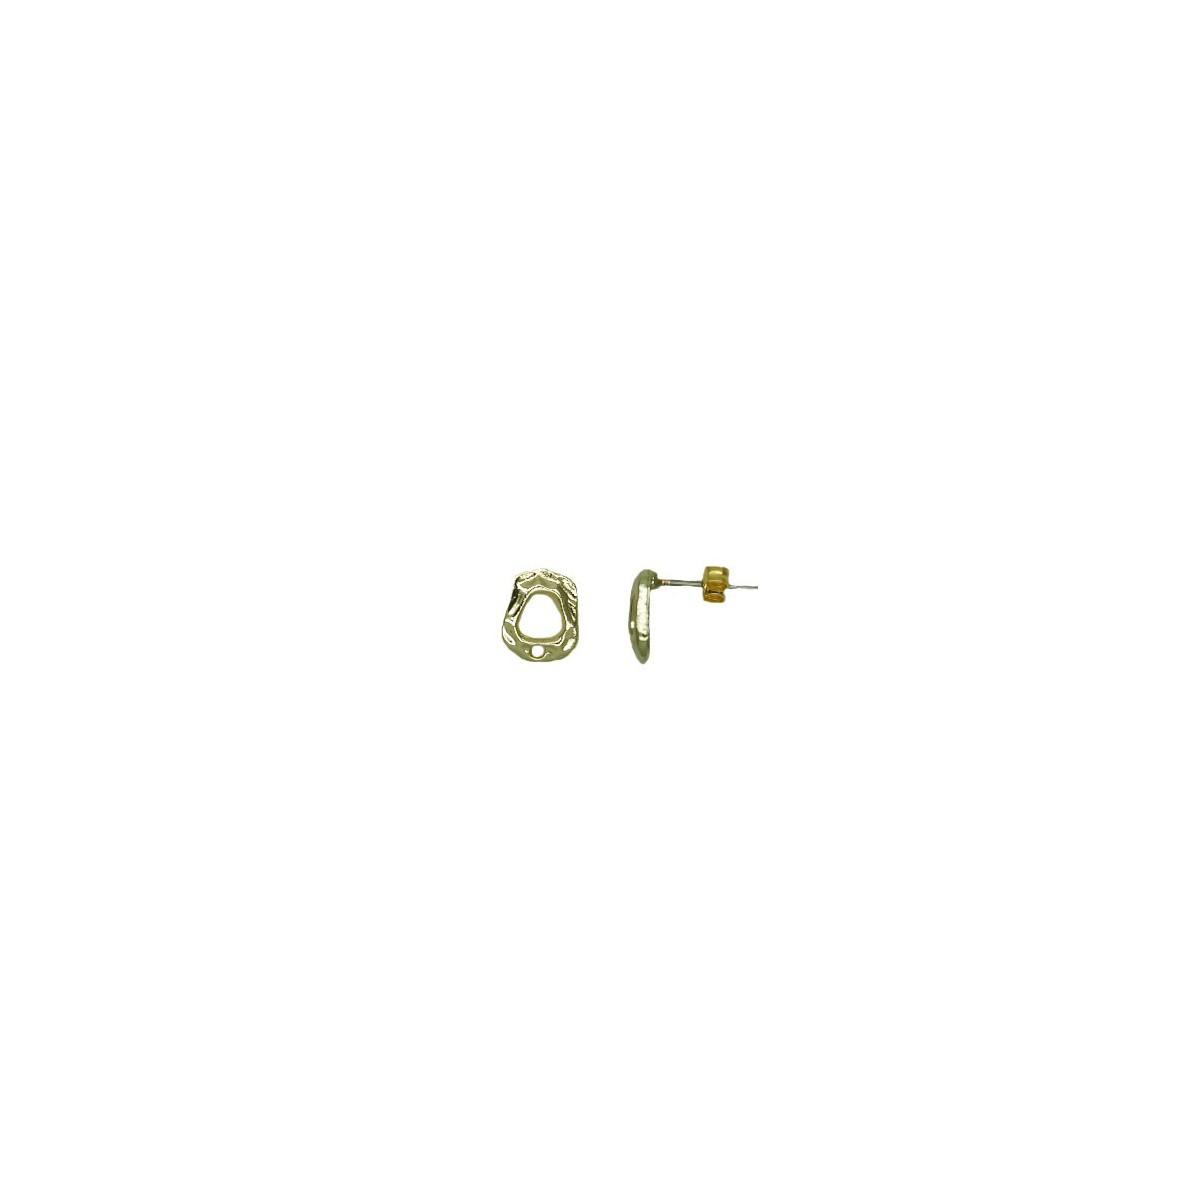 Orecchini in ottone rettangolari irregolari - 10x12 mm